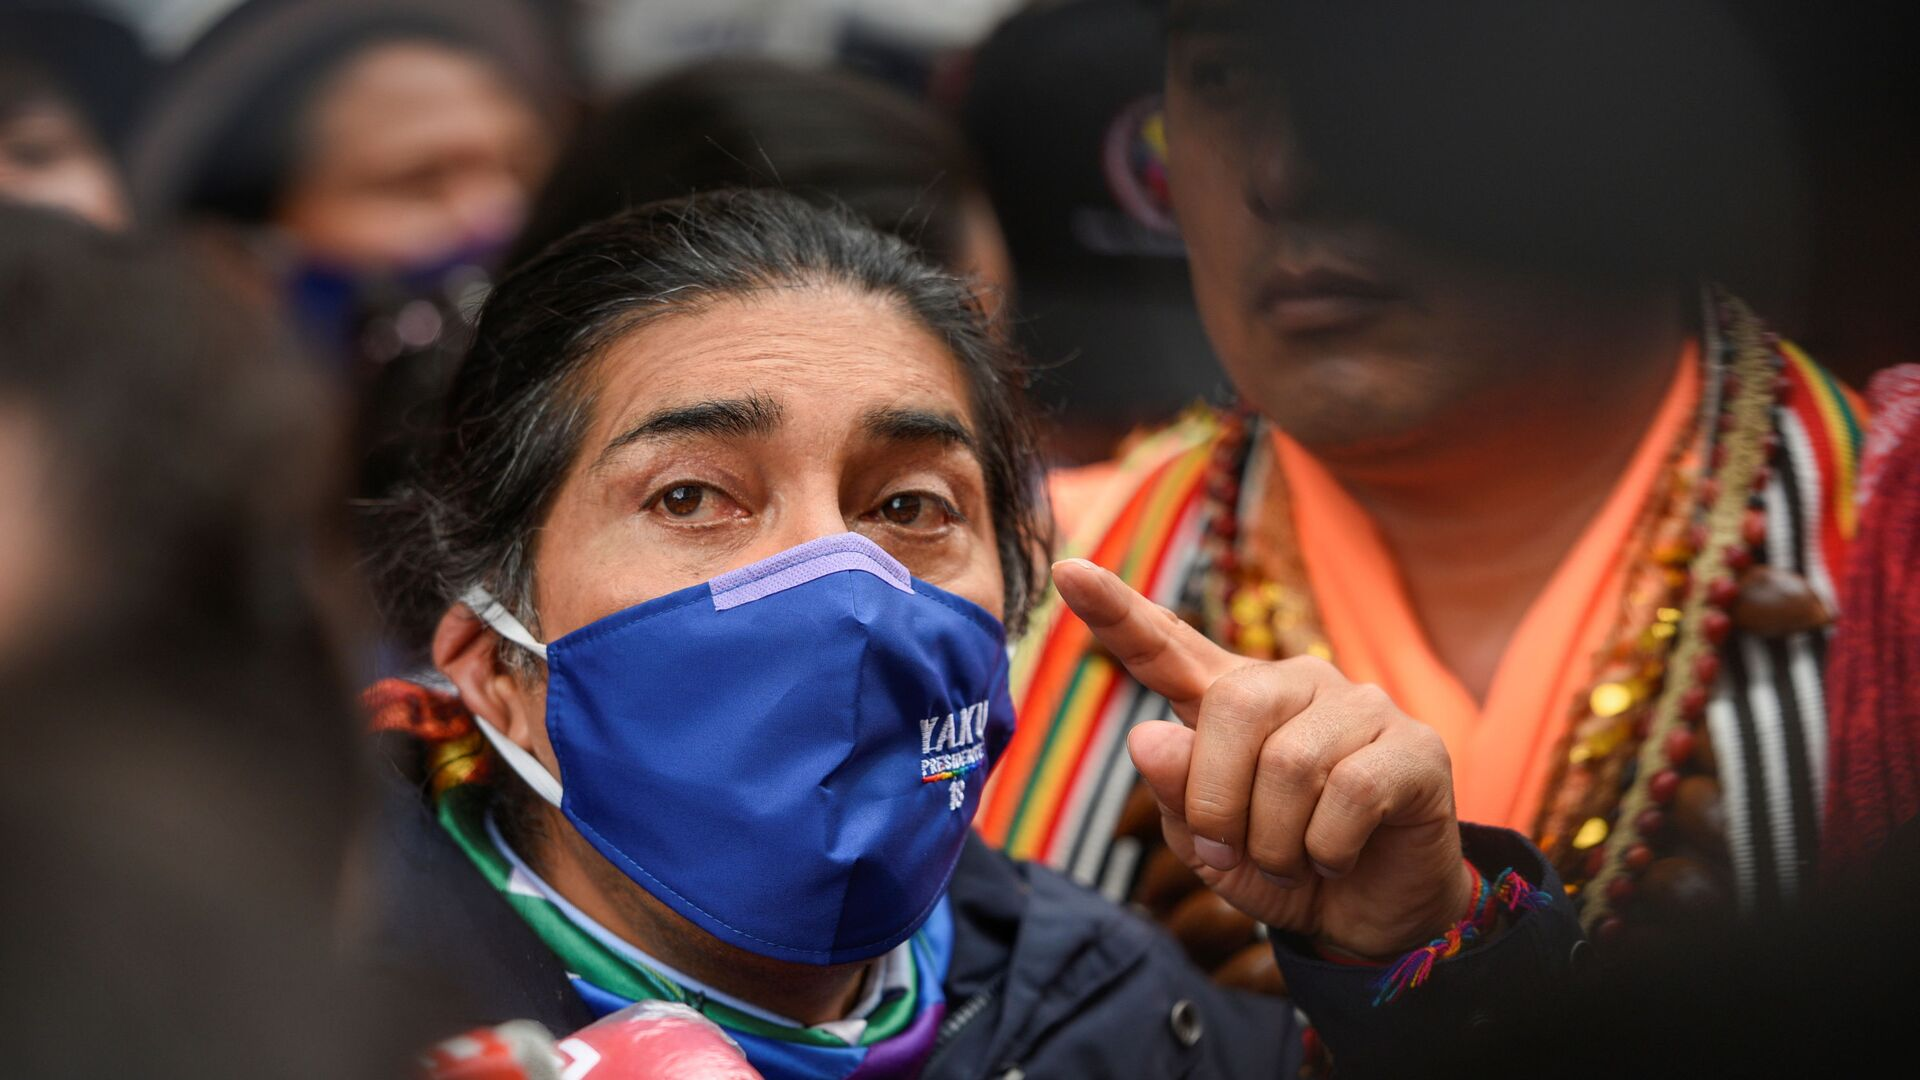 Yaku Pérez, el candidato indígena ecuatoriano - Sputnik Mundo, 1920, 12.02.2021